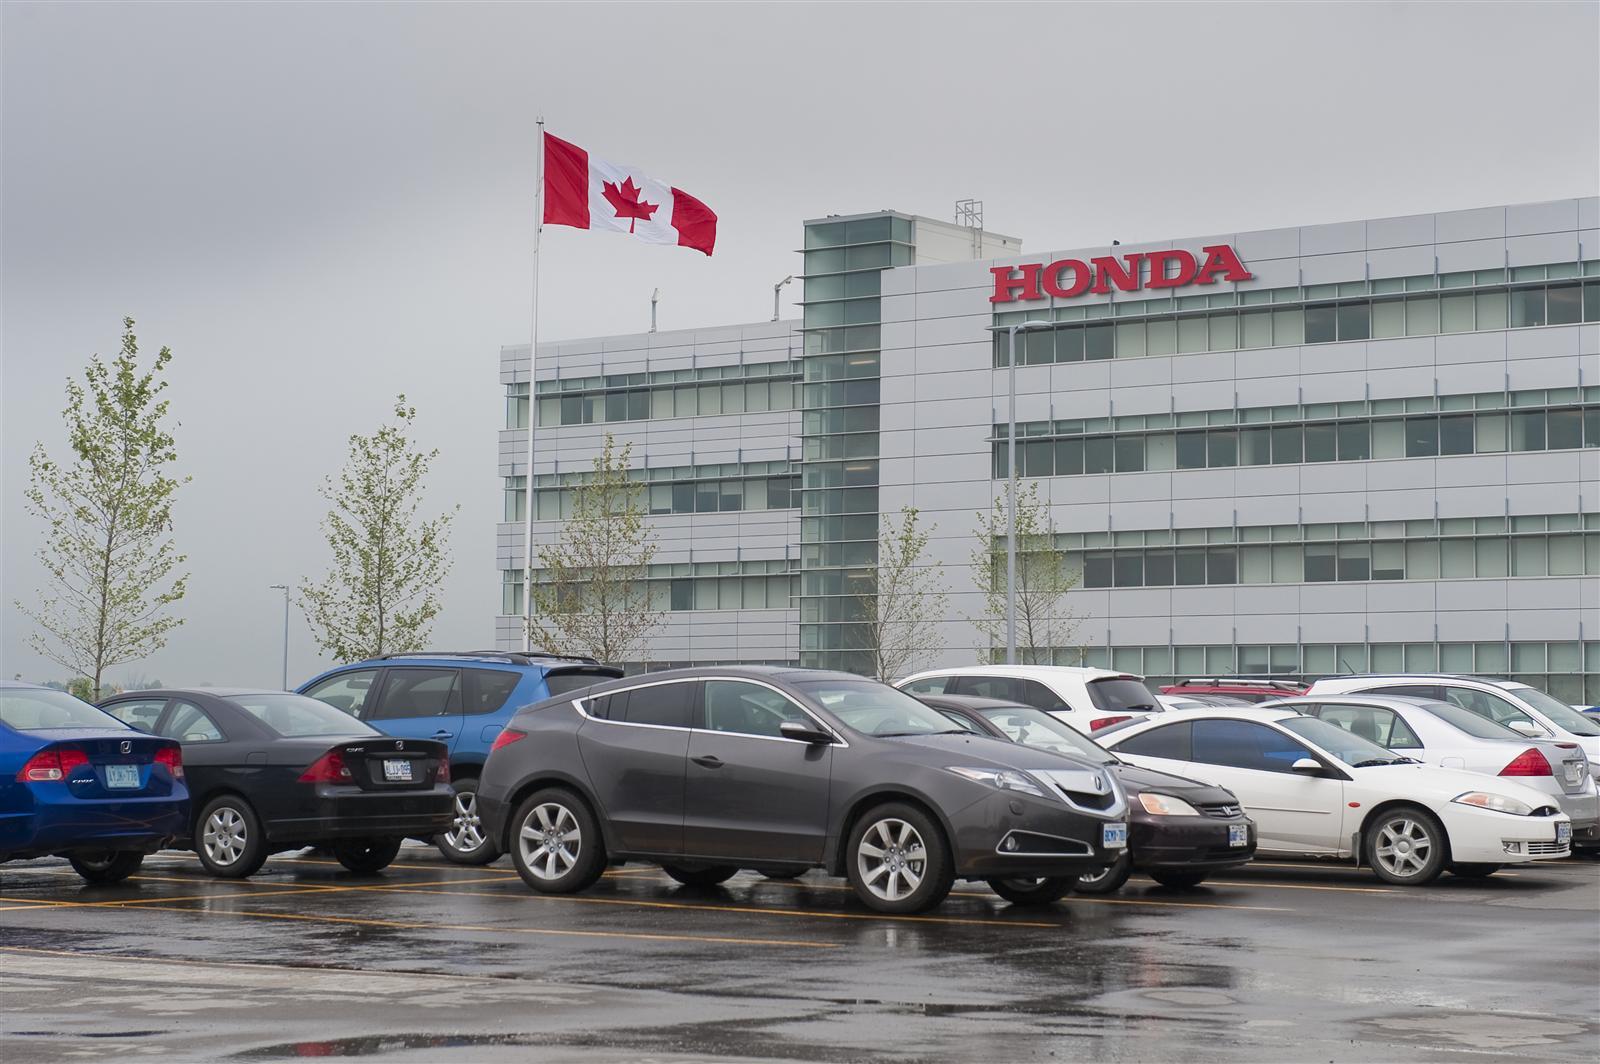 2422-honda-canada-corporate-headquarters-1916